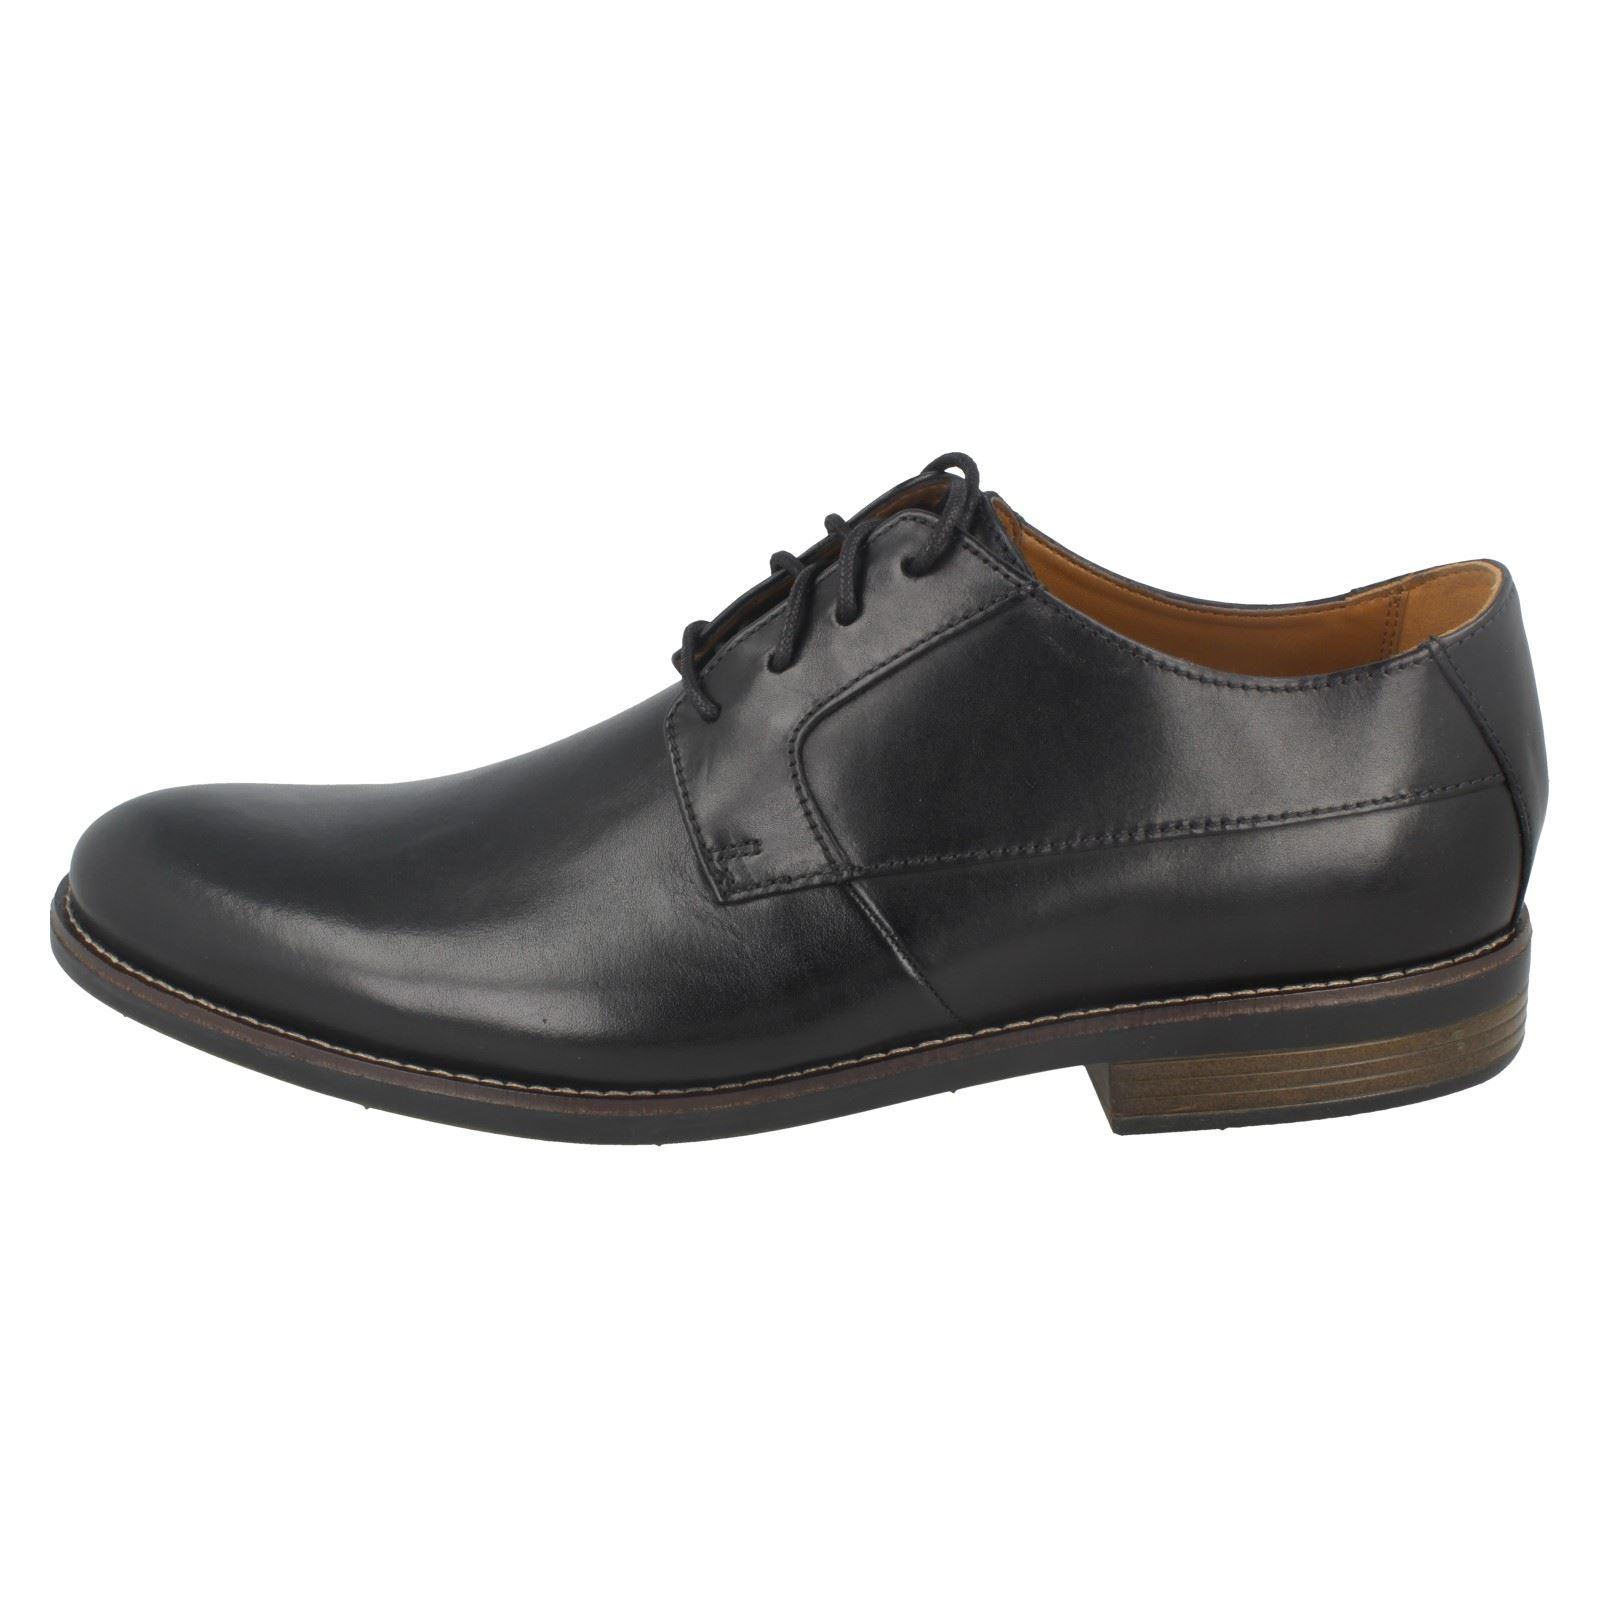 Mens Clarks Smart Stitch Detail Lace Up Leather Shoes Becken Plain